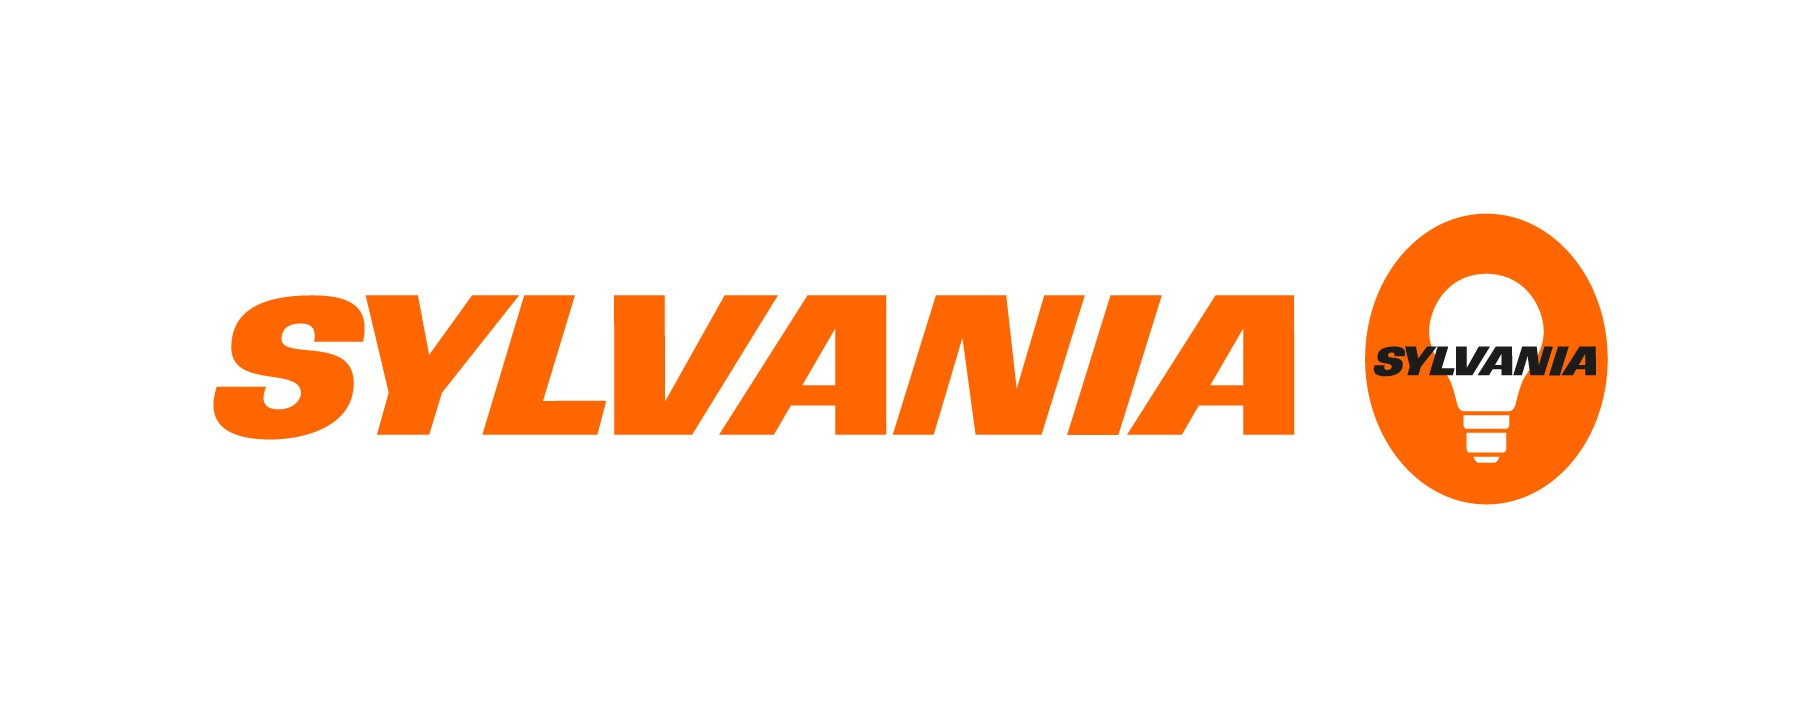 Marque : SYLVANIA